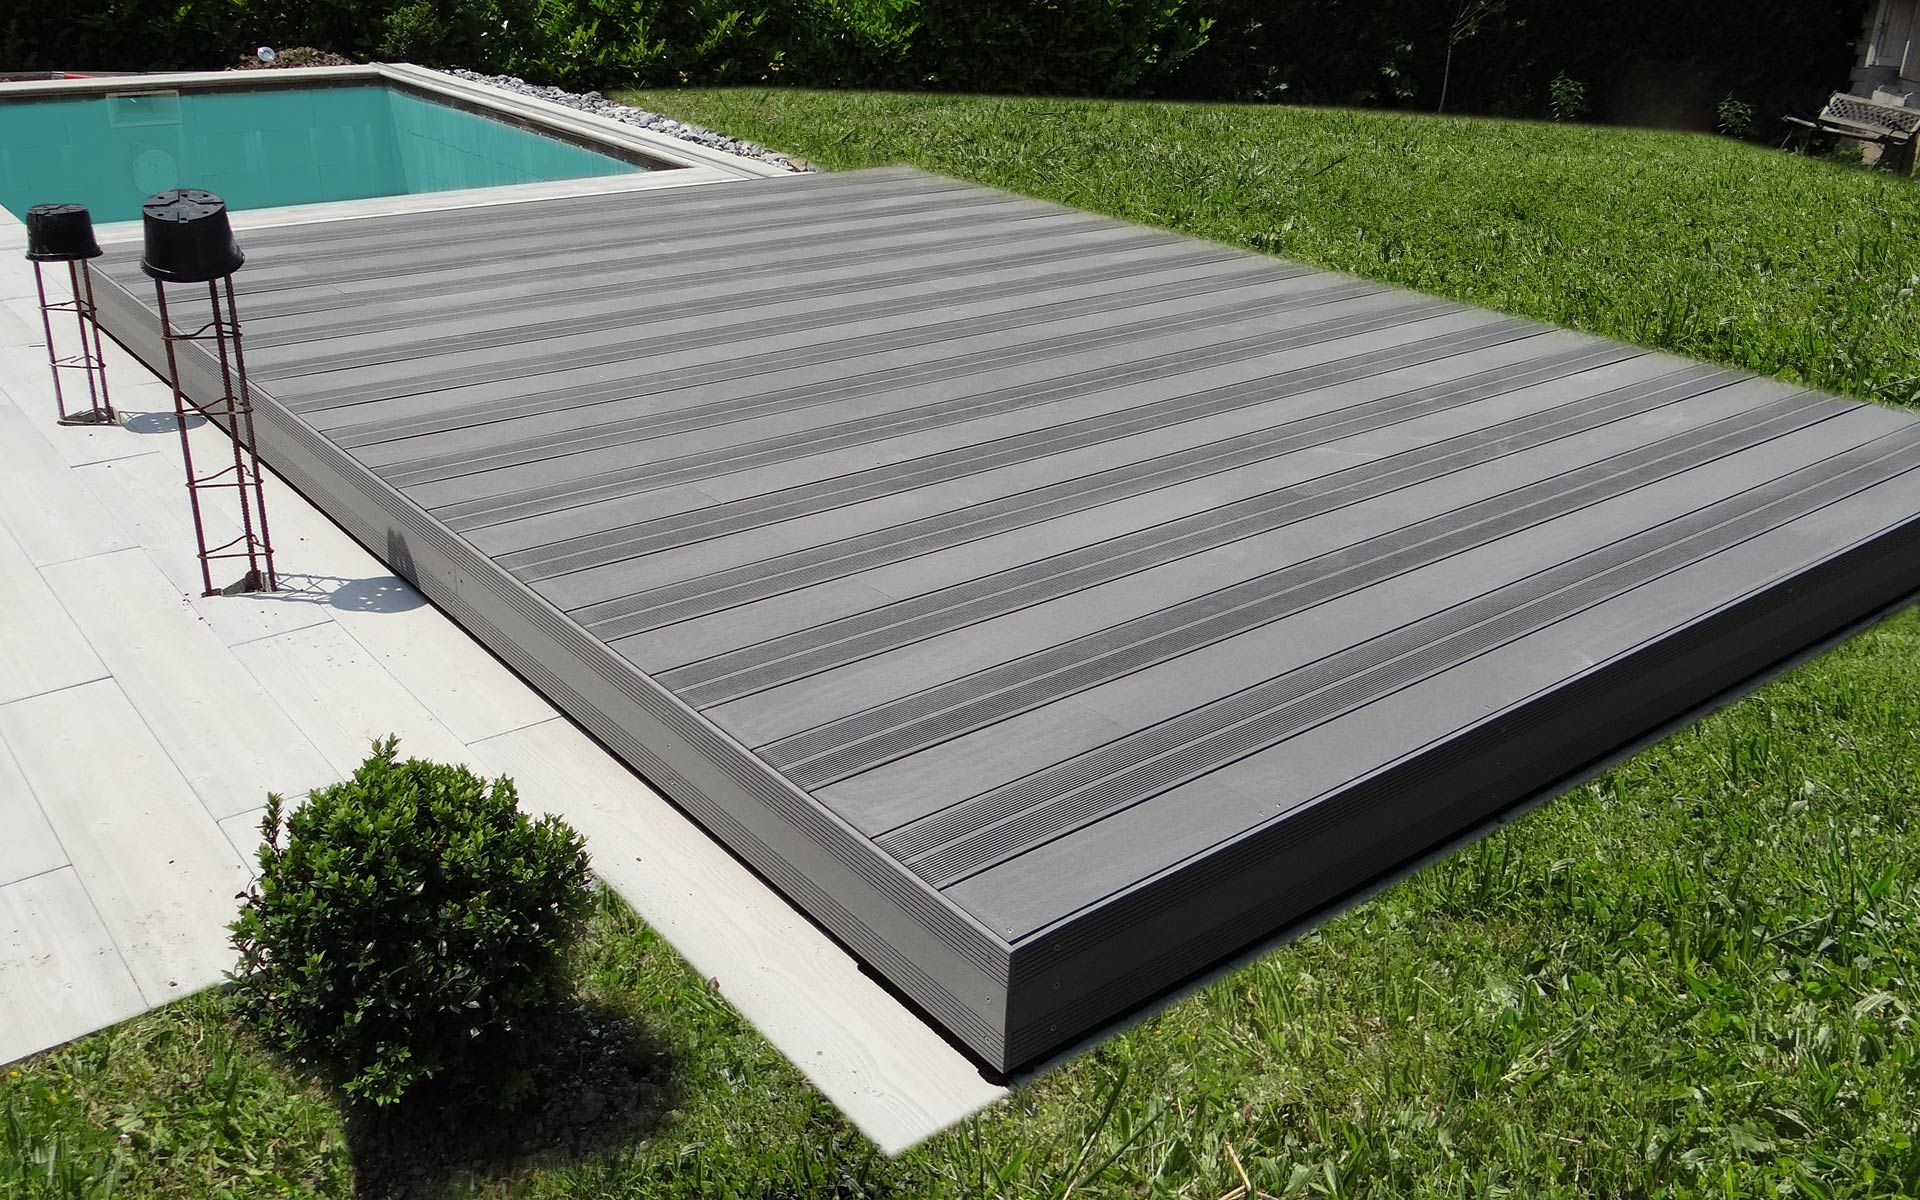 Plancher #coulissant #terrasse #mobile #piscine Plancher ... destiné Fabriquer Une Terrasse Mobile Pour Piscine